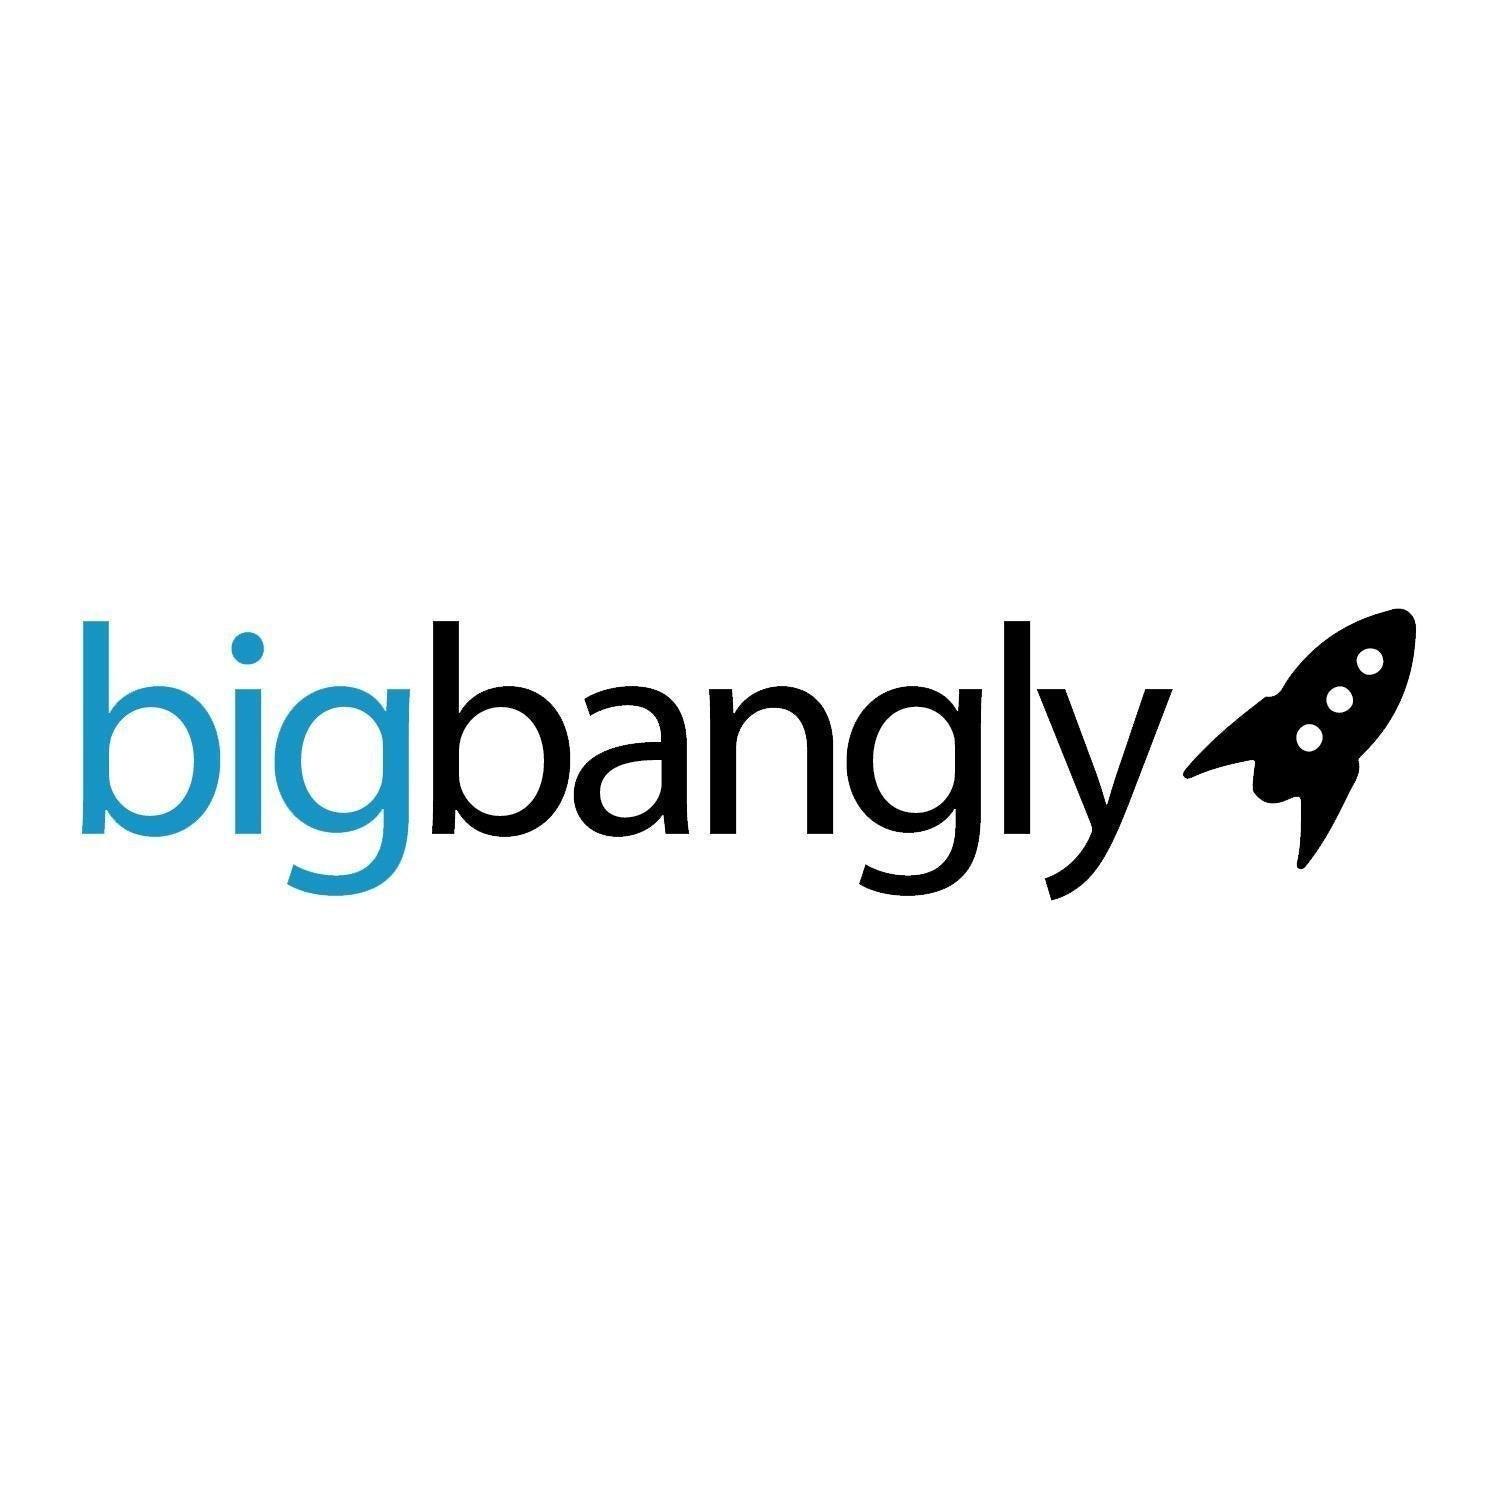 BigBangly